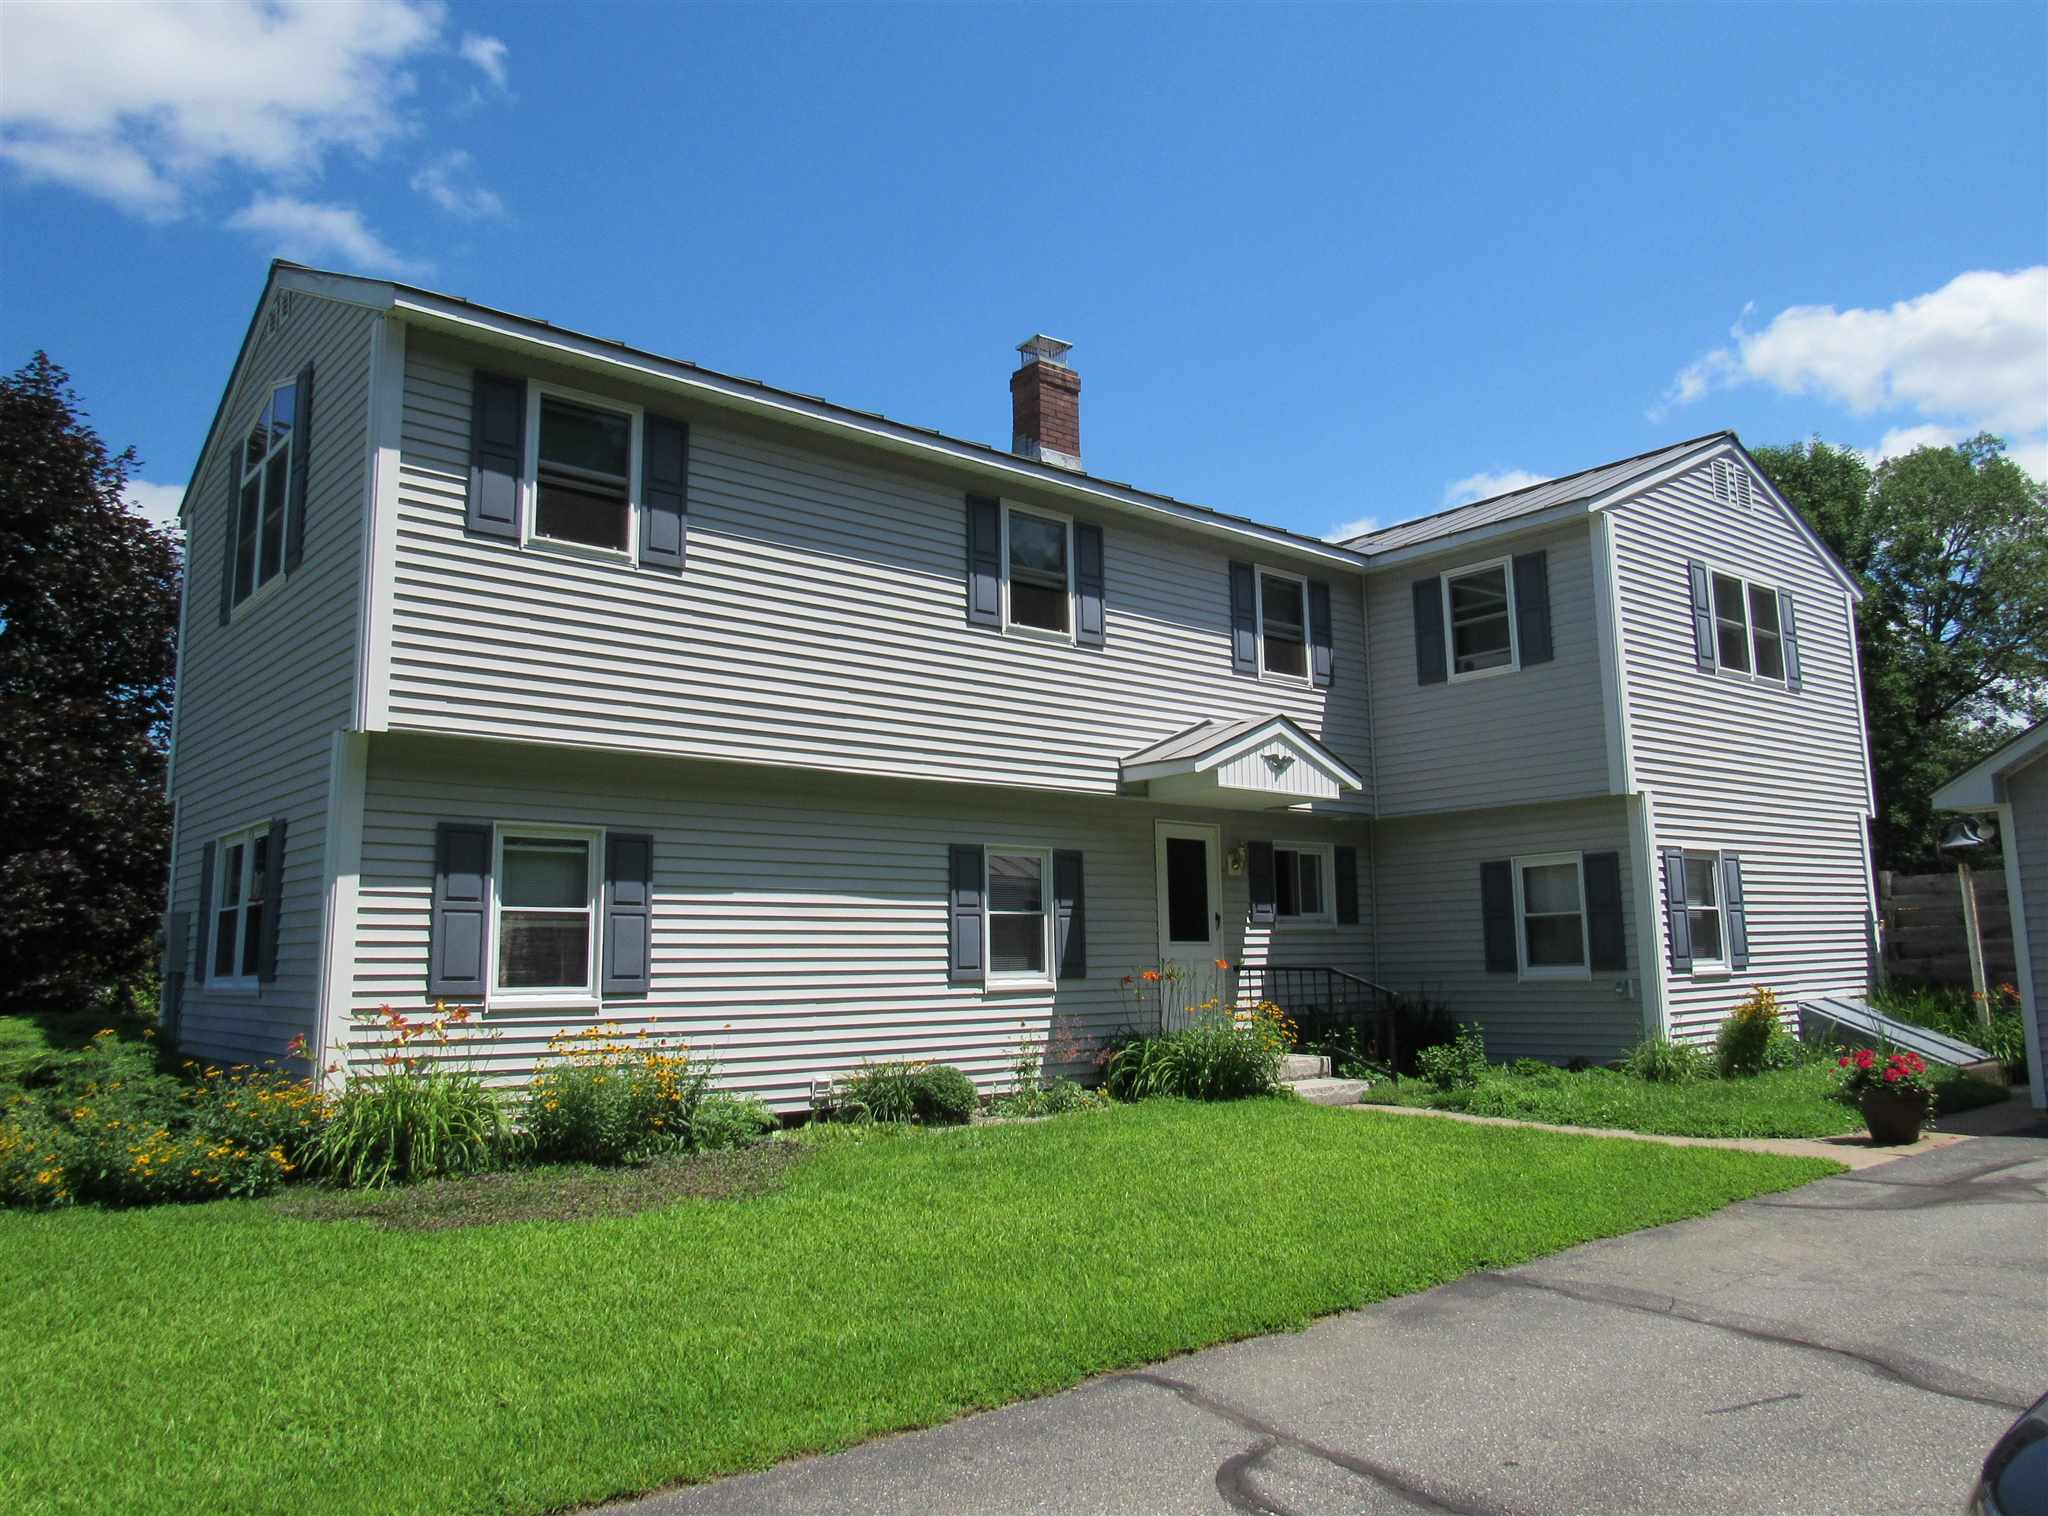 Homes in Charlestown NH